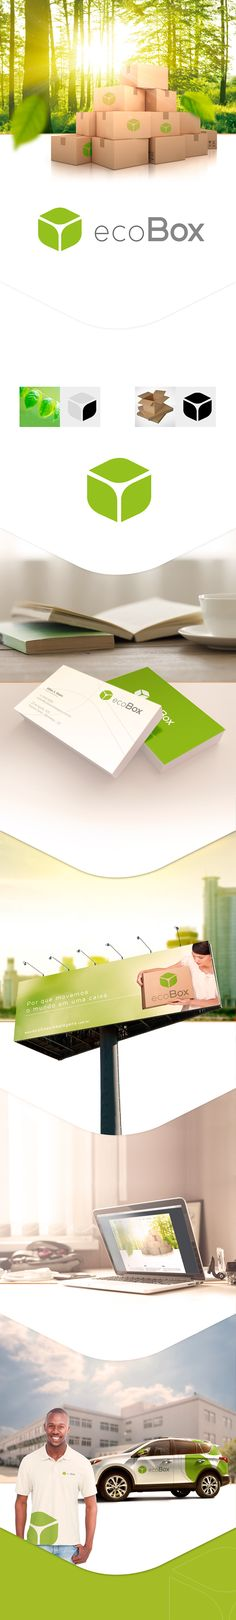 Indentidade Visual | ecoBox on Behance